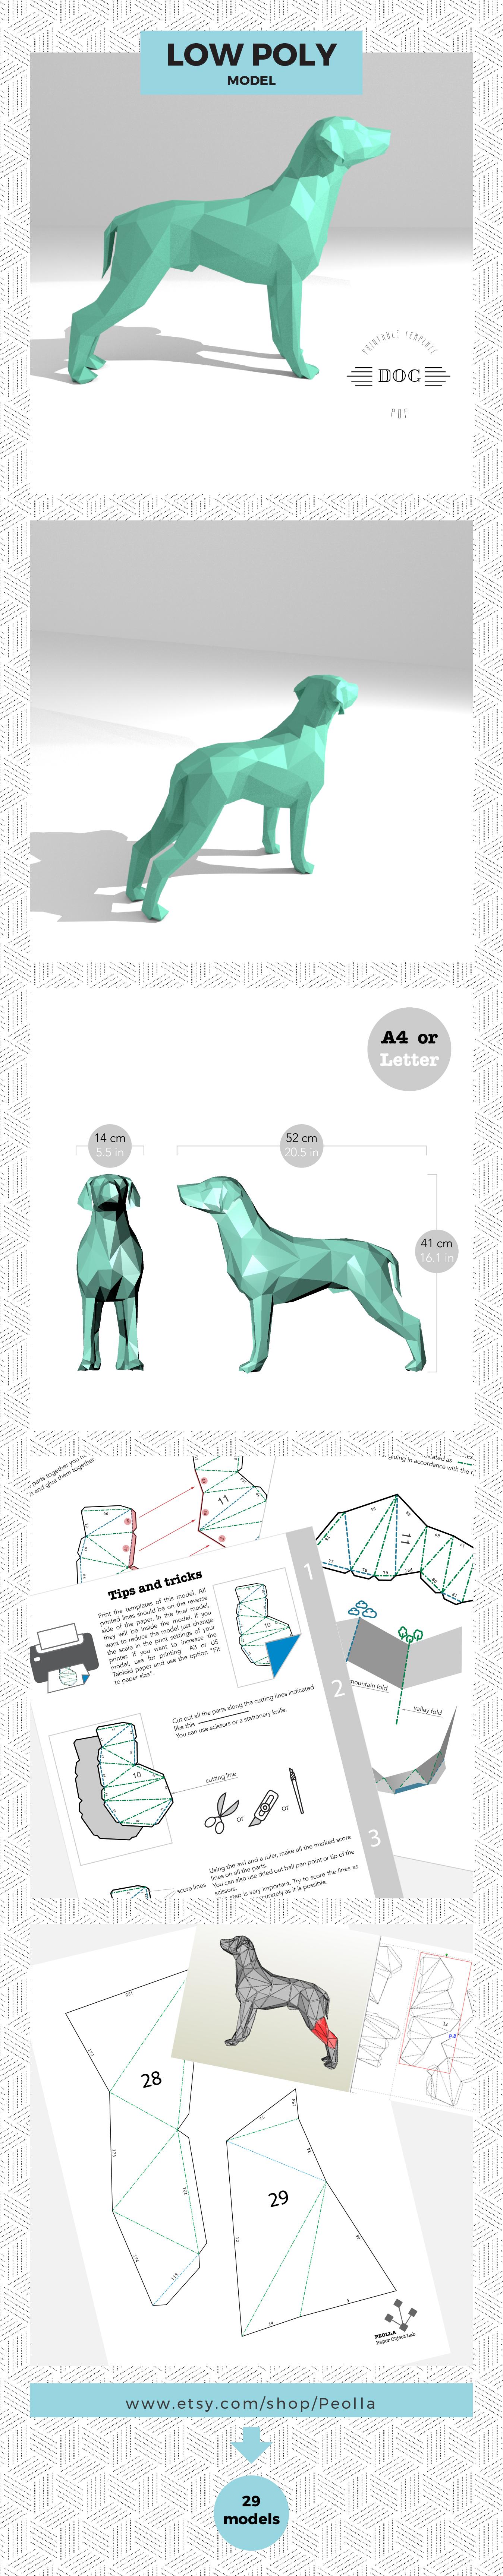 Printable Diy Template Pdf Dog Low Poly Paper Model 3d Animal